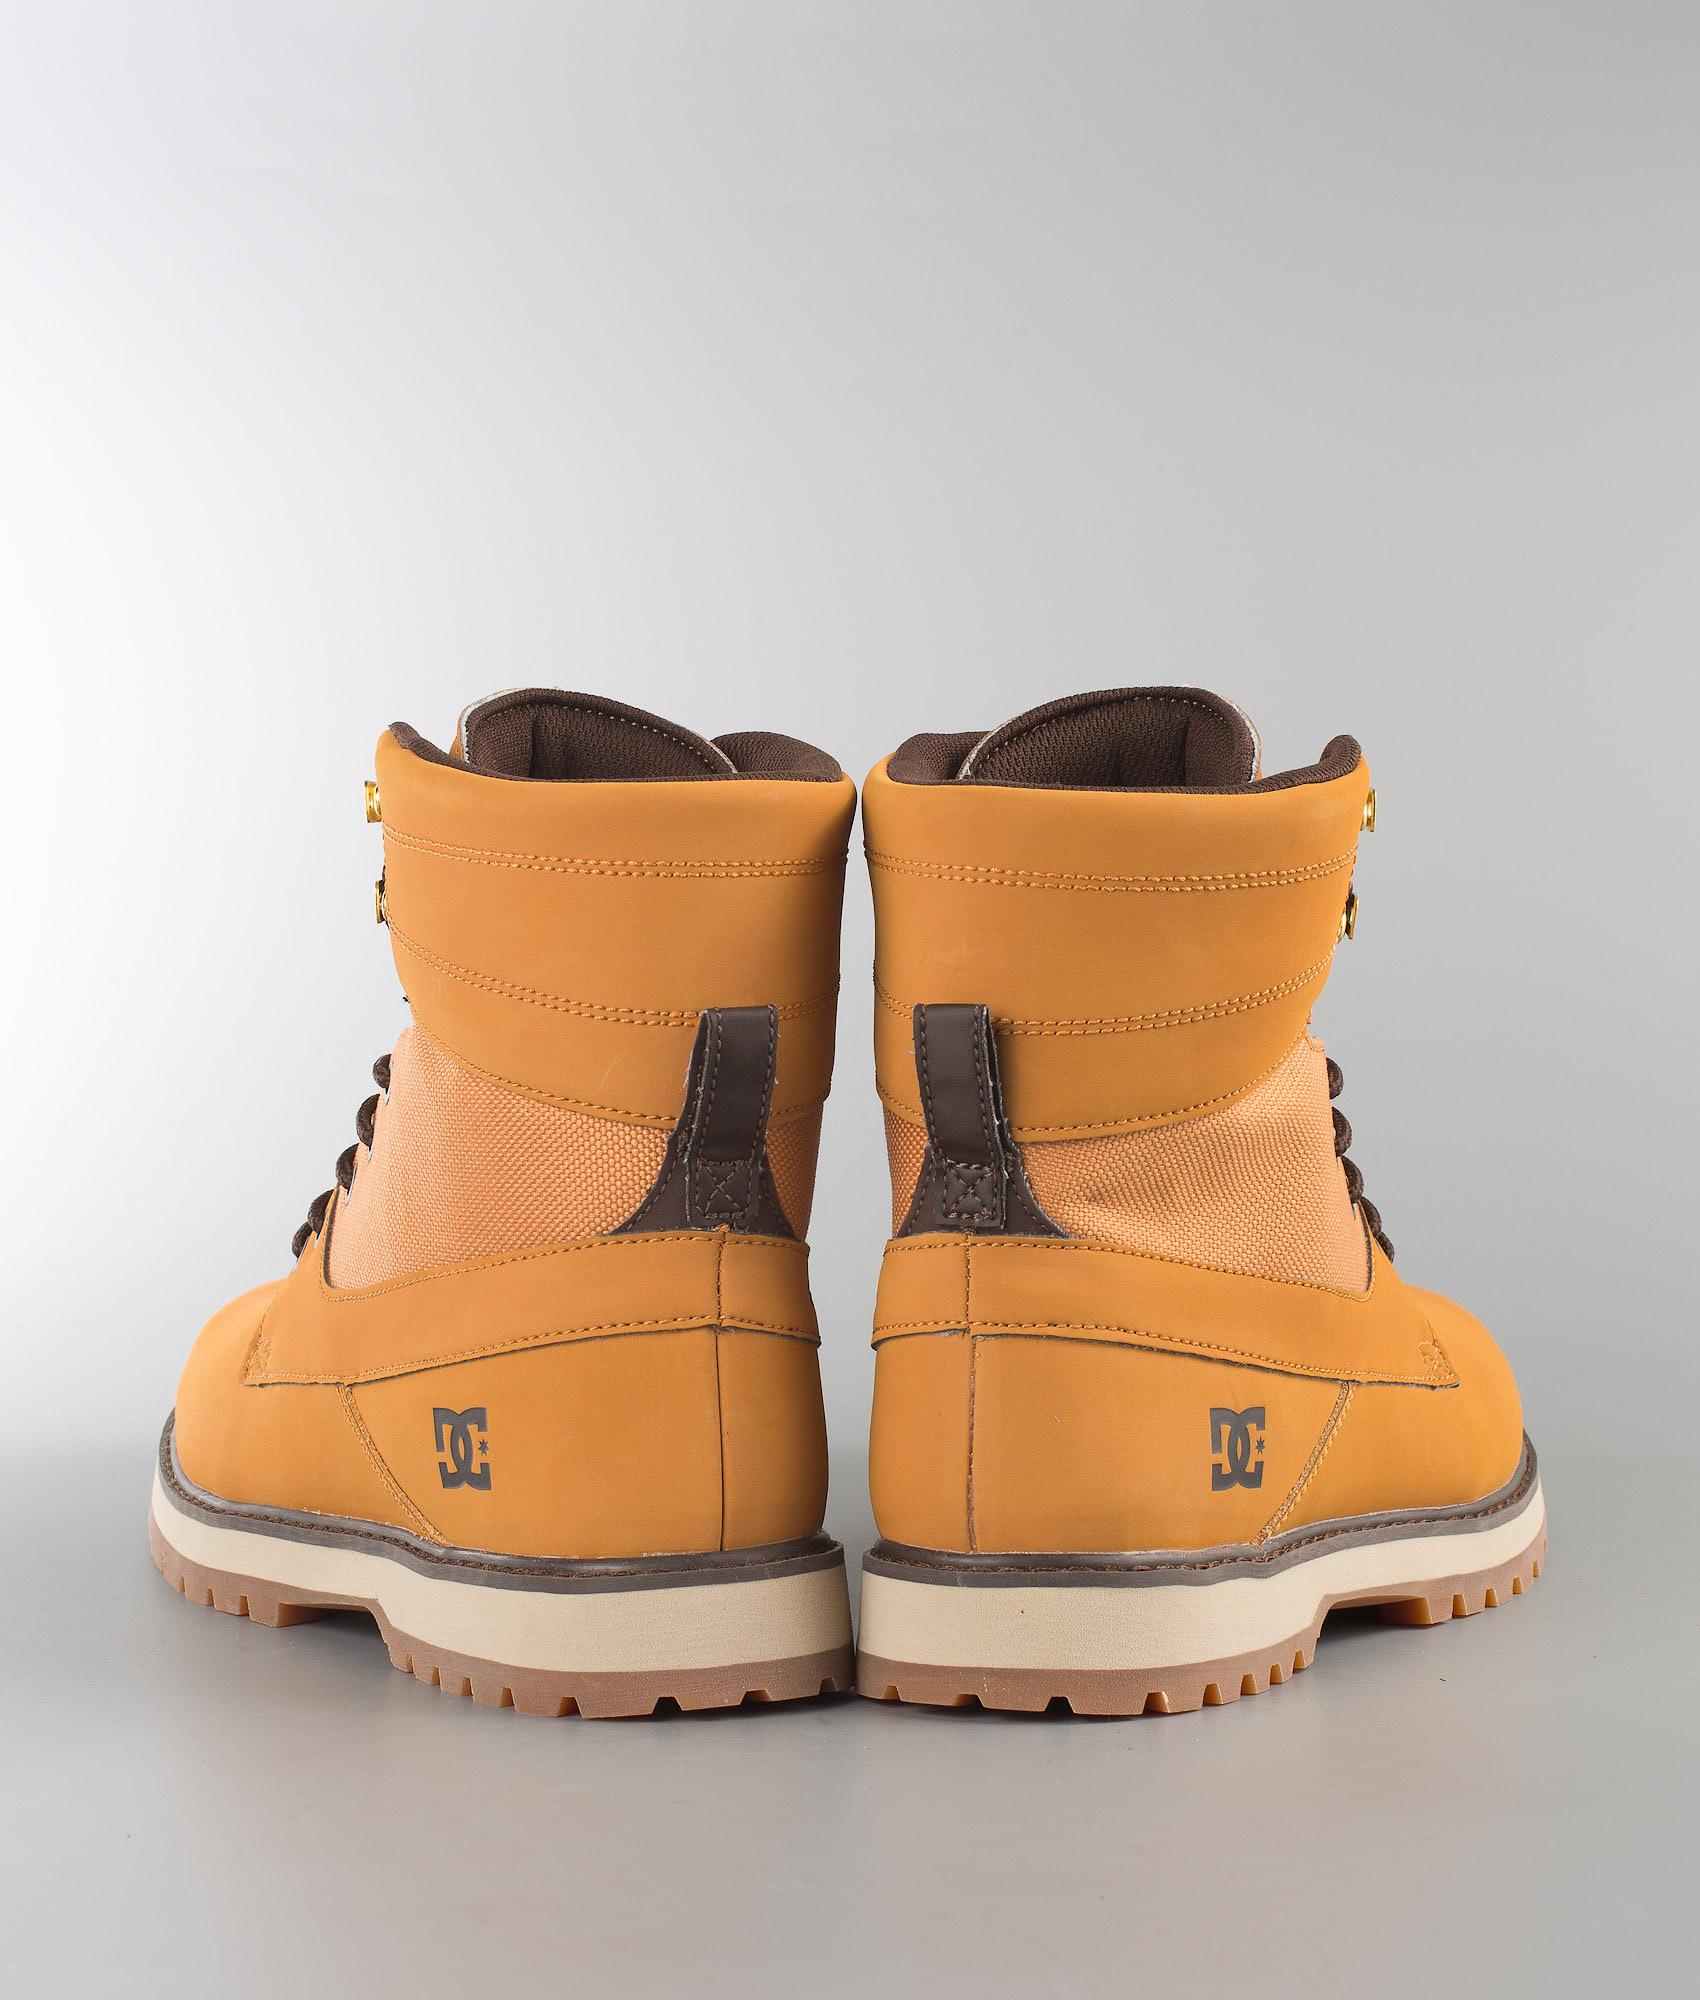 1b3f0726a010 DC Uncas Shoes Wheat/Black/Dk Chocolate - Ridestore.com